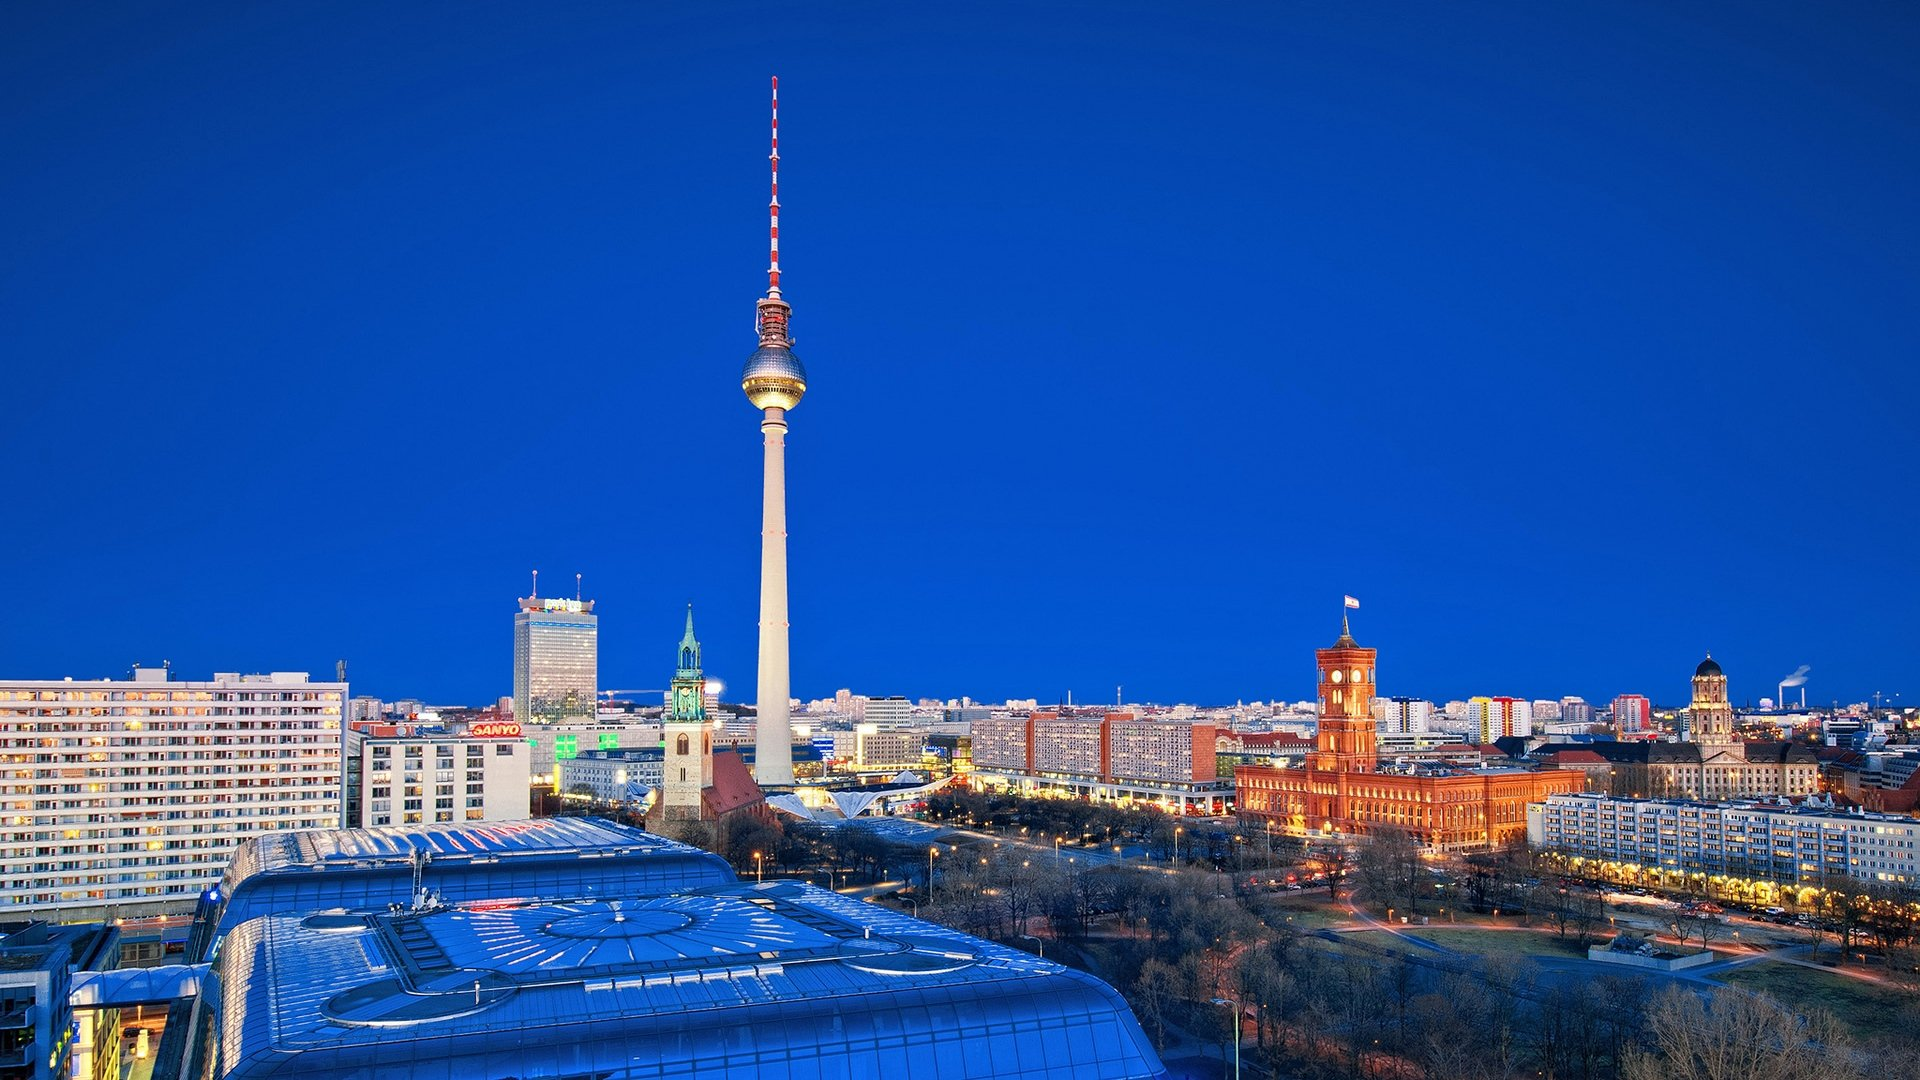 Berlin full screen hd wallpaper